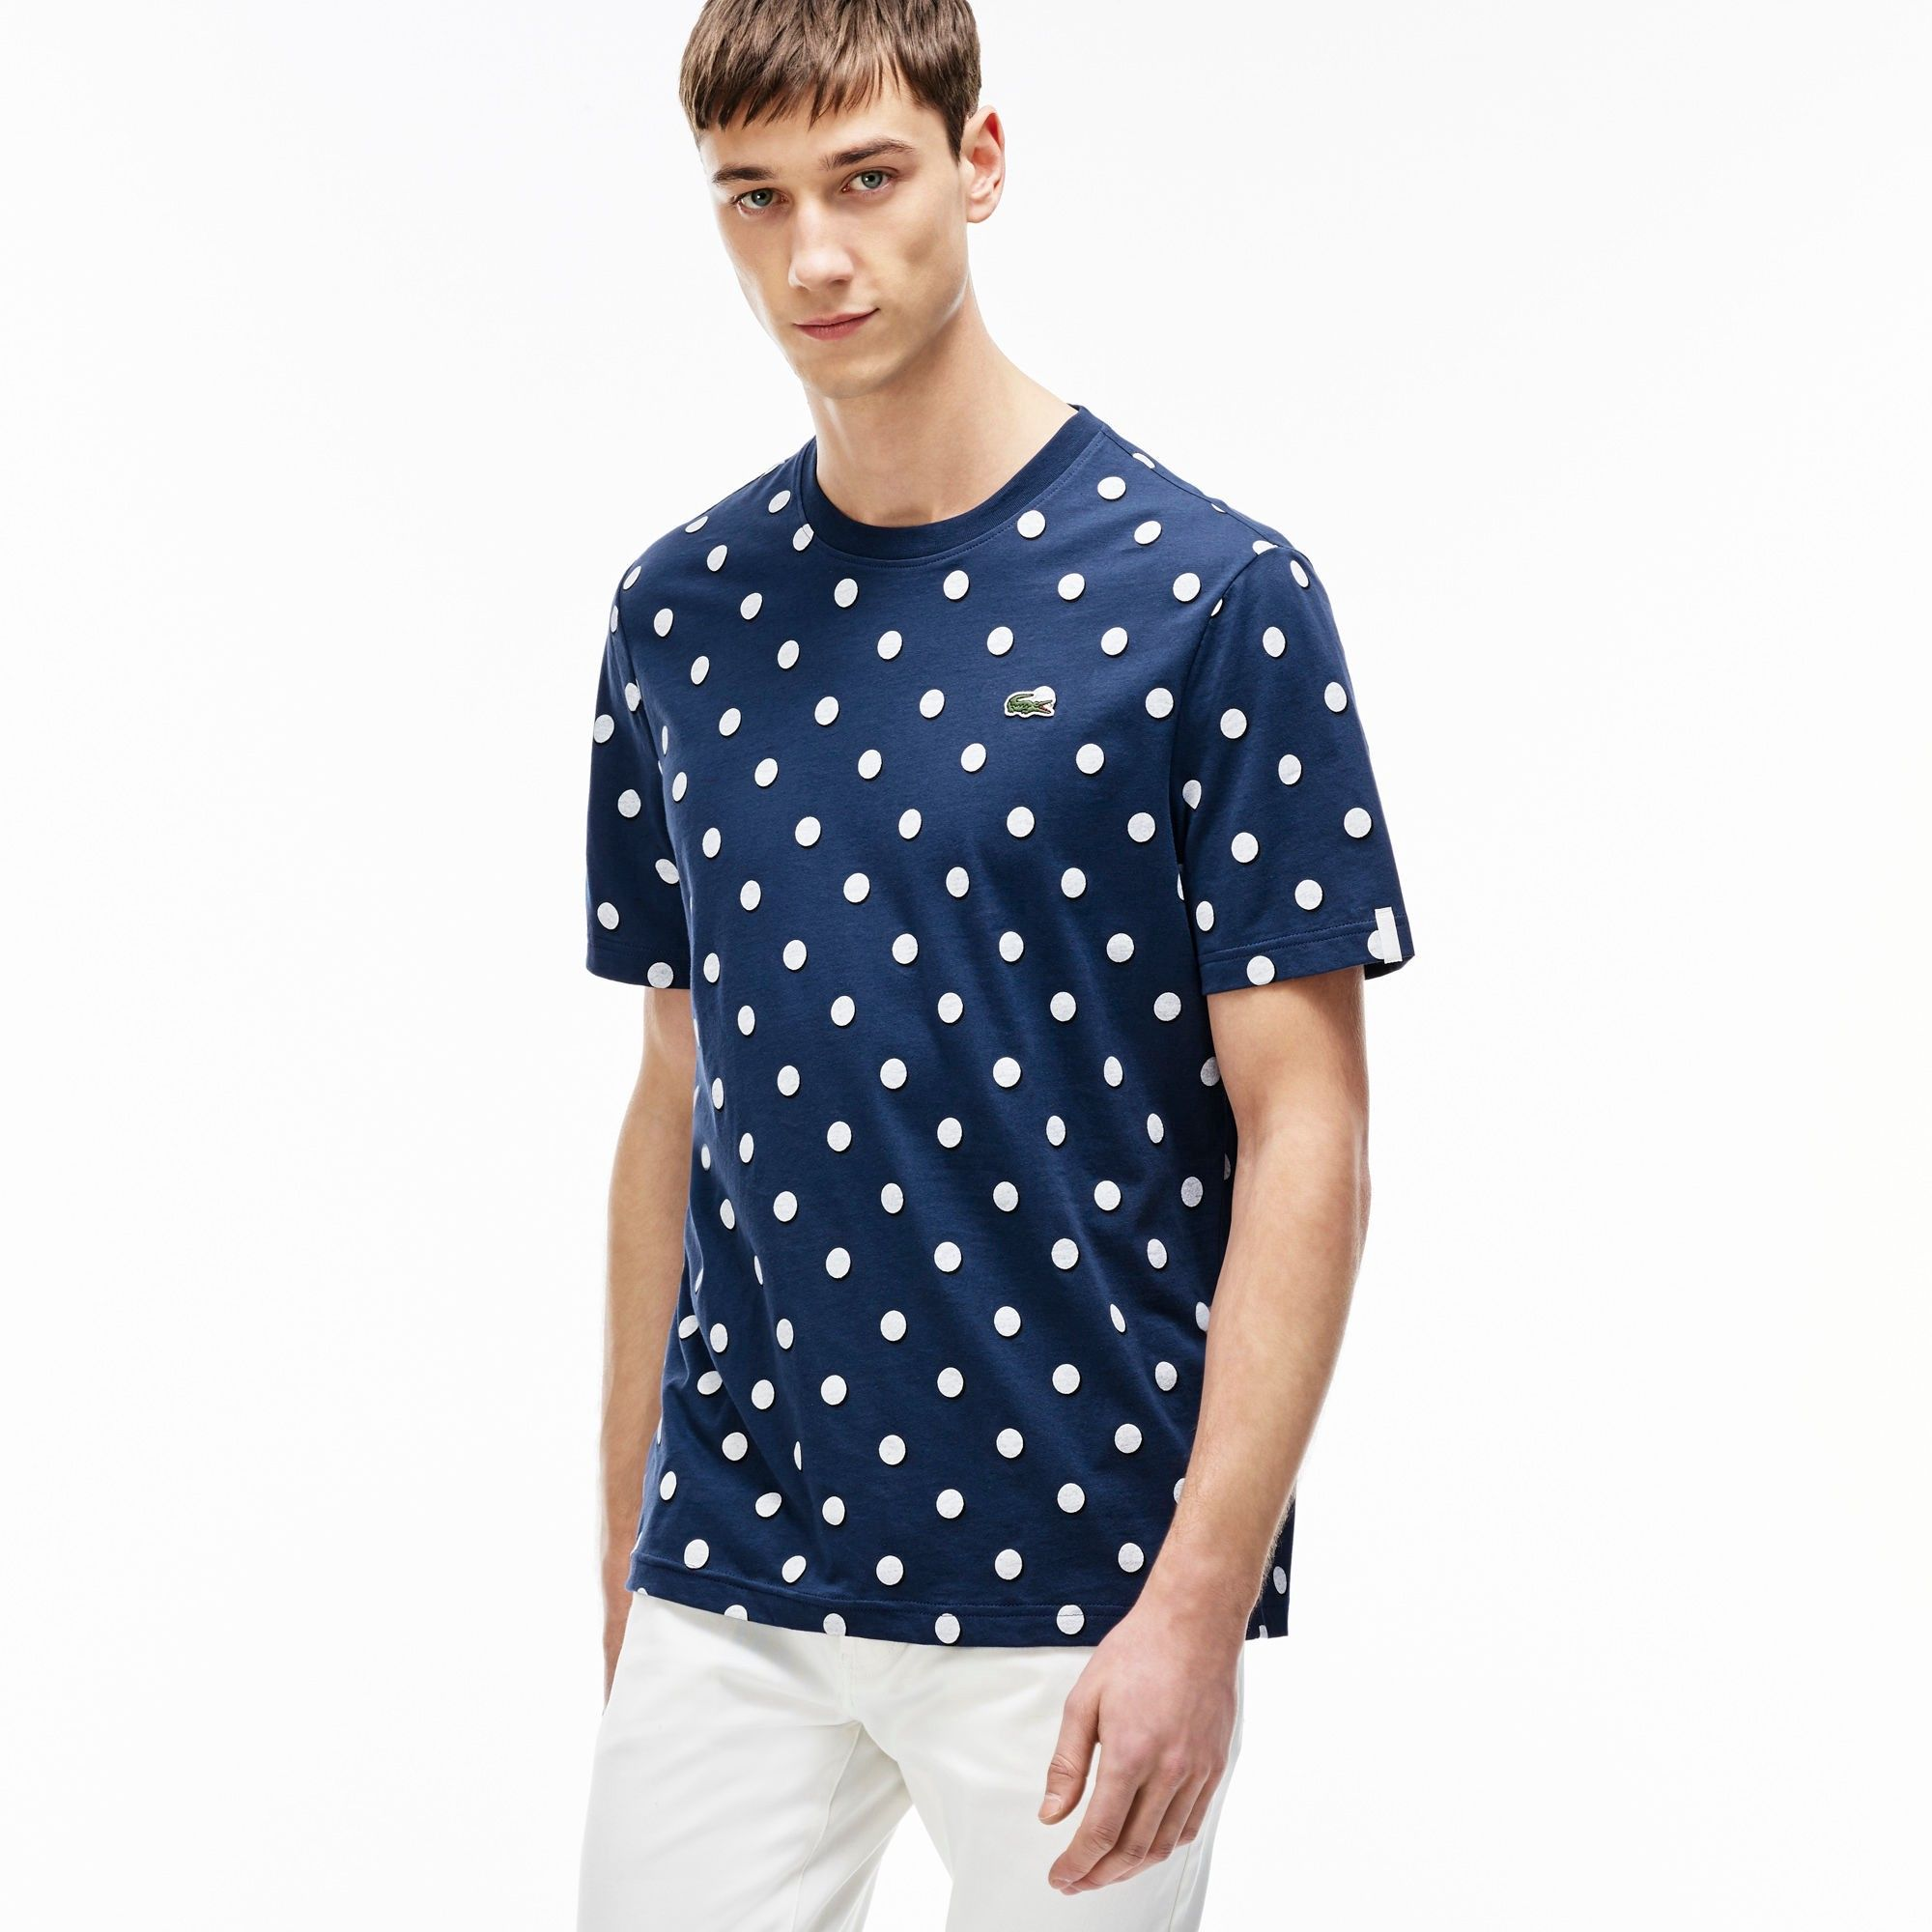 Lacoste Men S L Ve Crew Neck Polka Dot Jersey T Shirt Modesens